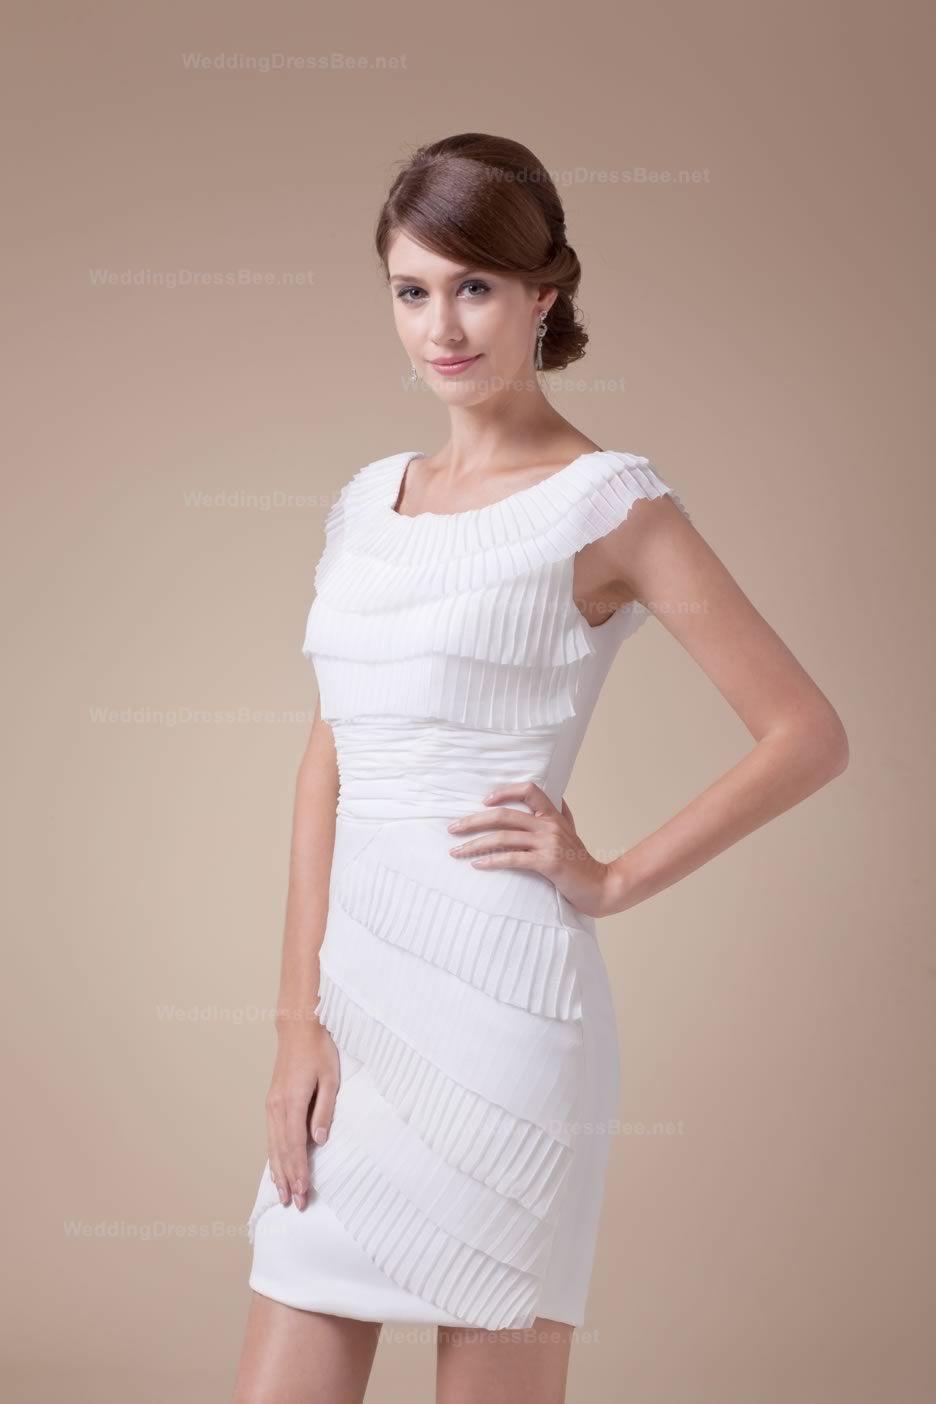 Silk sheath wedding dress  Lovely Scoop Neckline Capped Sleeves Short Sheath Dress With Ruffles